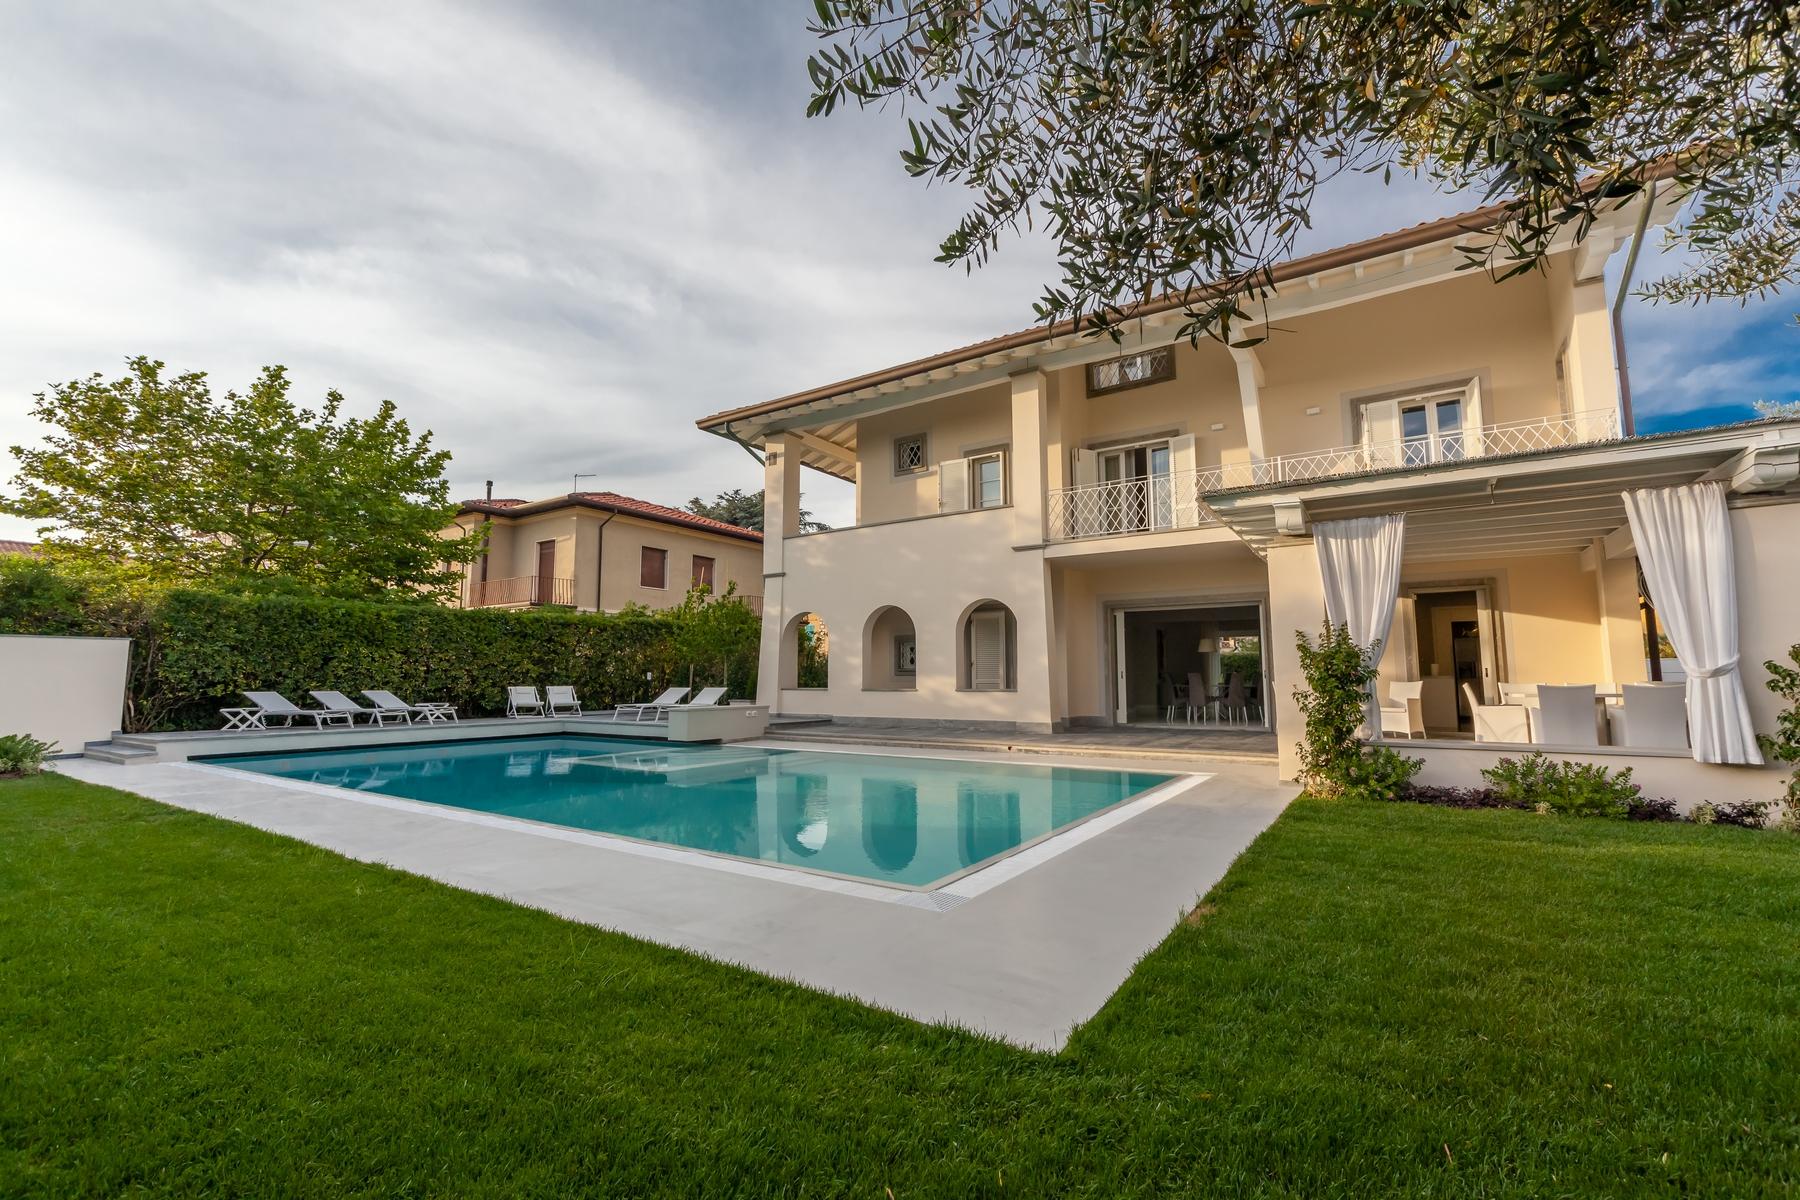 Other Residential for Sale at Splendid villa with swimming pool in Forte dei Marmi Forte Dei Marmi, Lucca, Italy